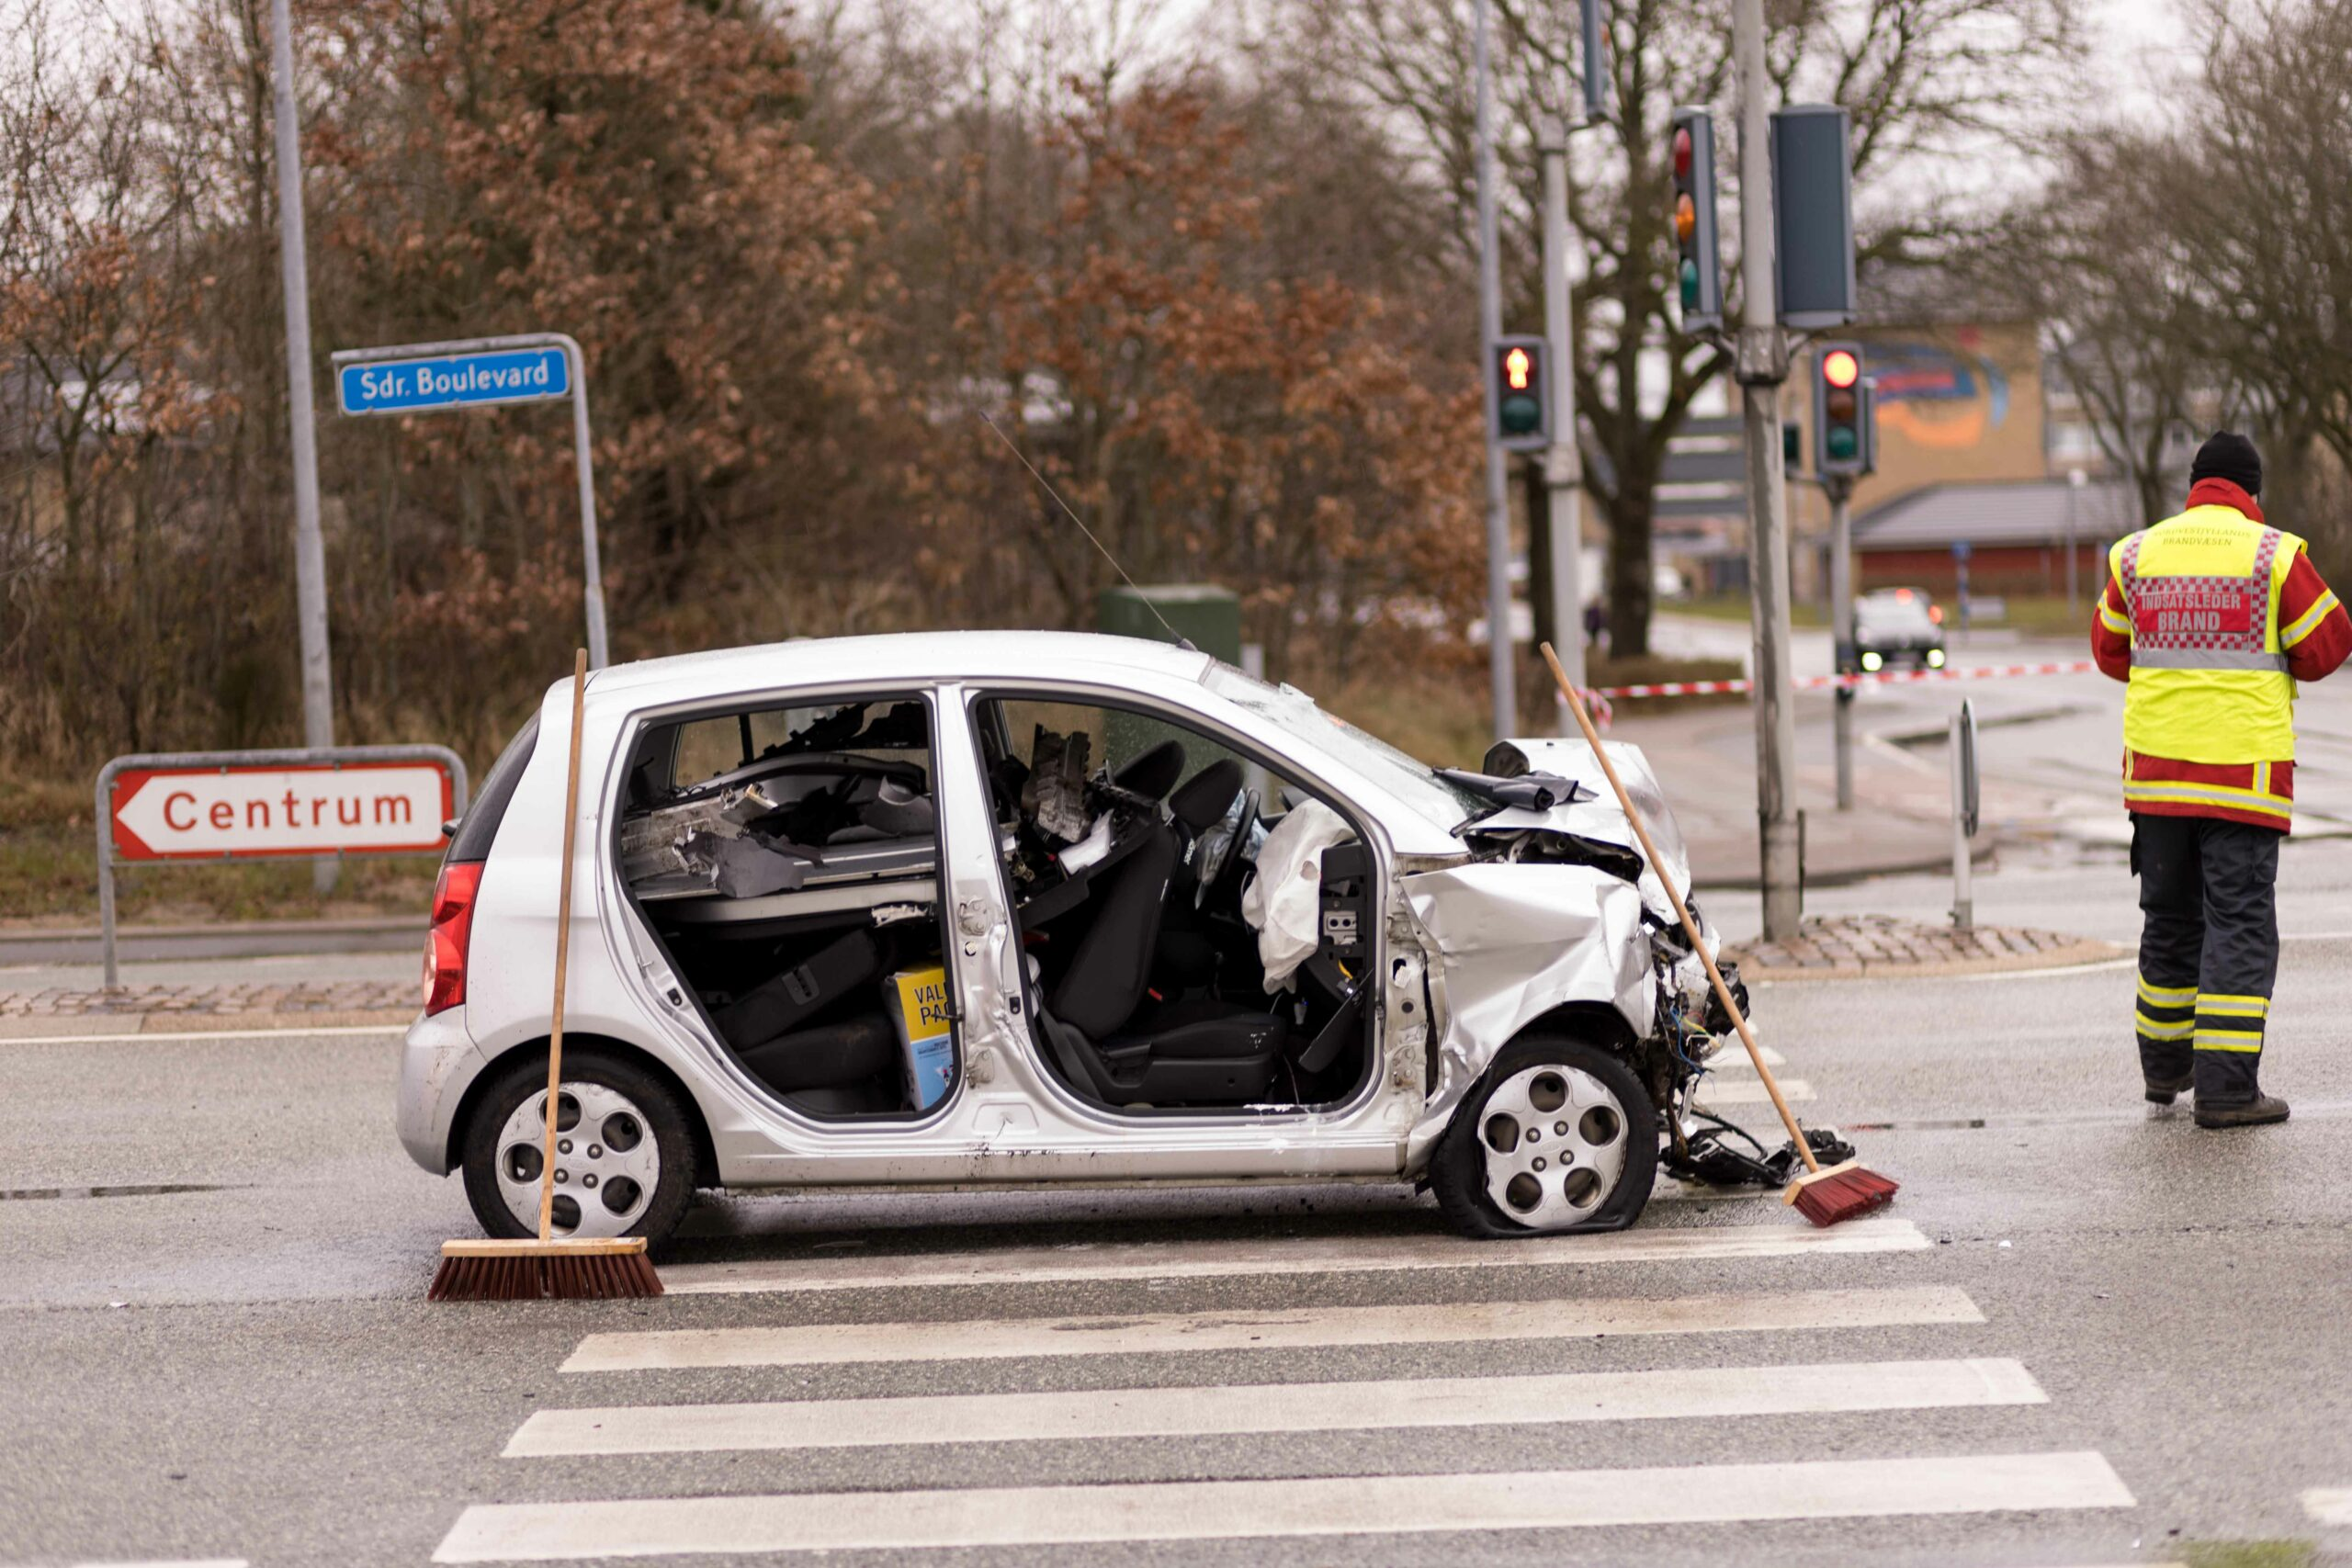 Voldsomt biluheld med fastklemte i Skive